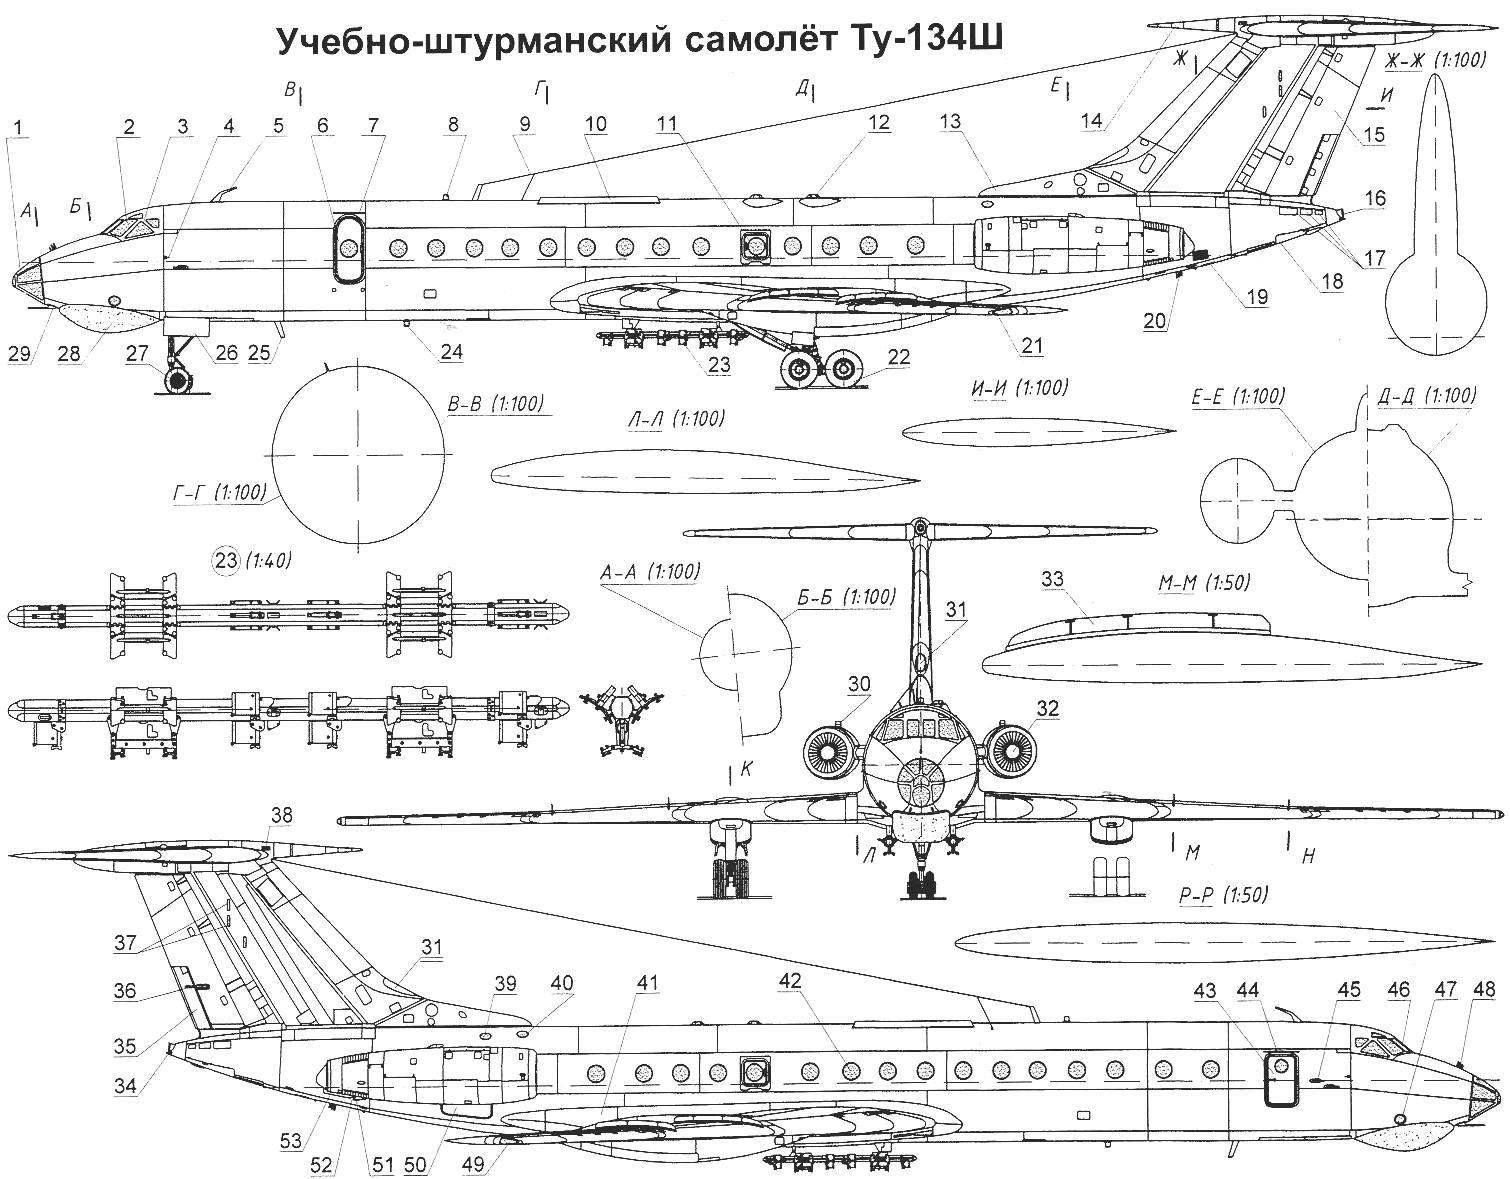 Учебно-штурманский самолёт Ту-134Ш